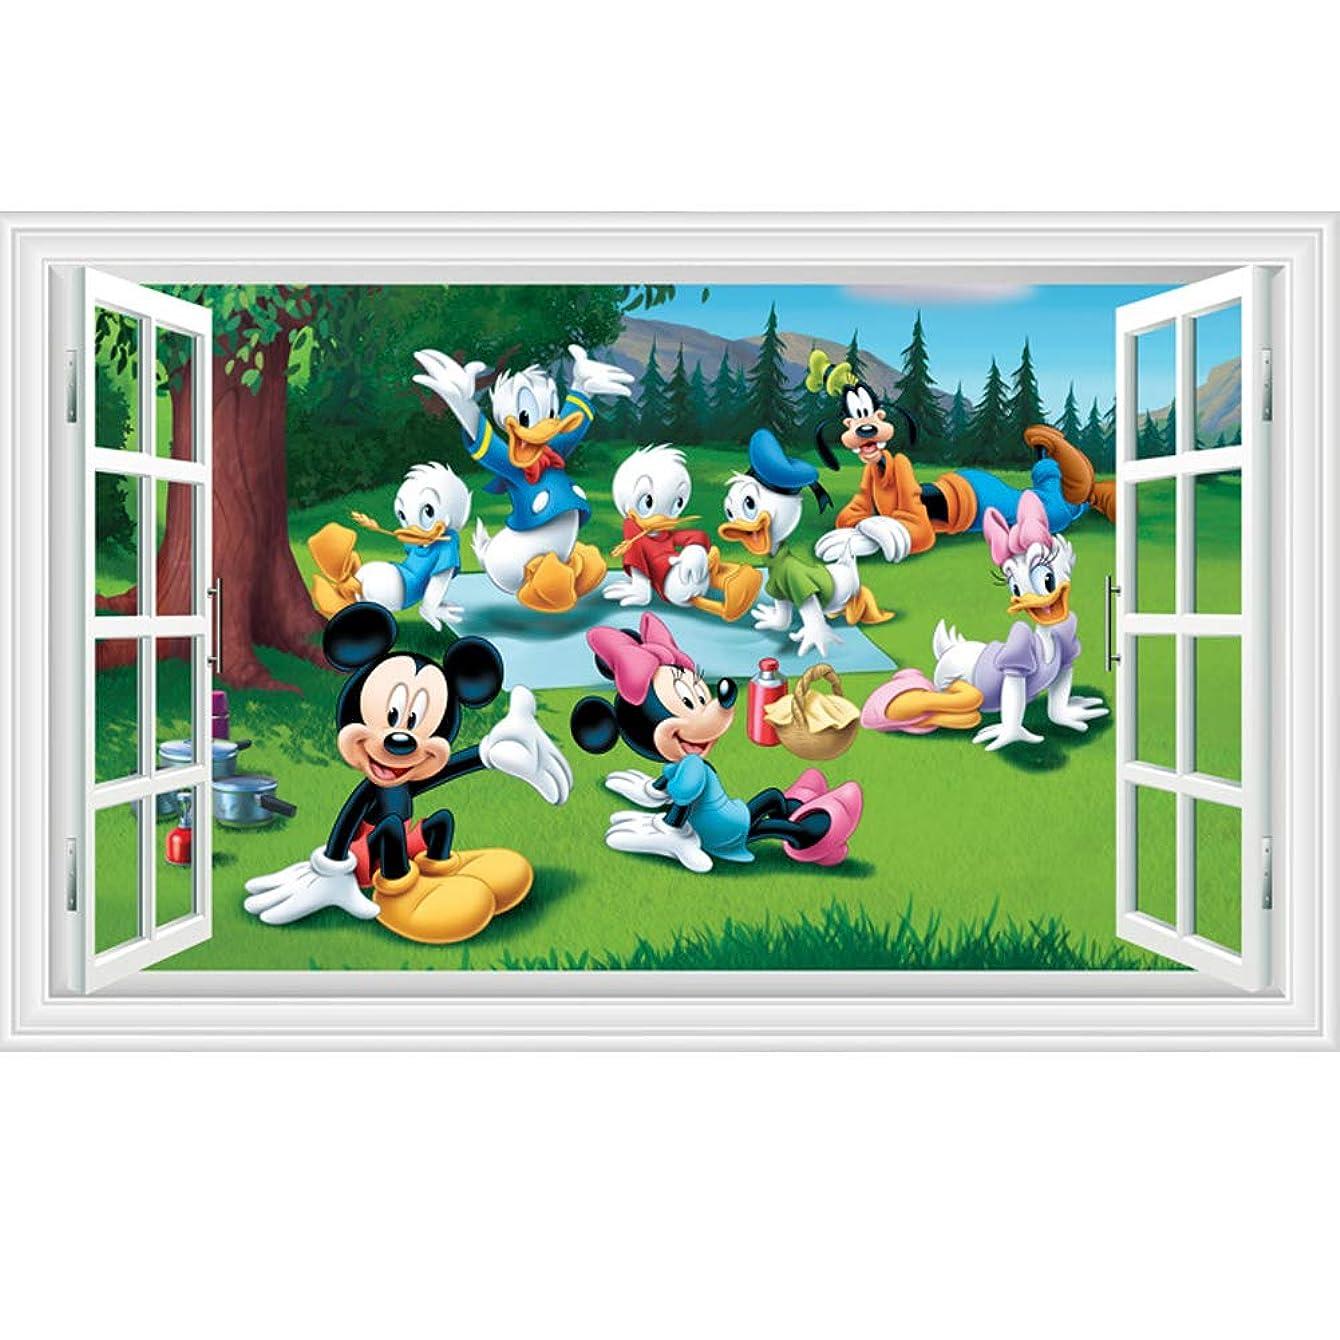 Fangeplus(TM DIY Removable 3D Window View Disney Cartoon Mickey?Mouse?and?Donald?Duck Art Mural Vinyl Waterproof Wall Stickers Kids Room Decor Nursery Decal Sticker Wallpaper 35.4''x23.6''